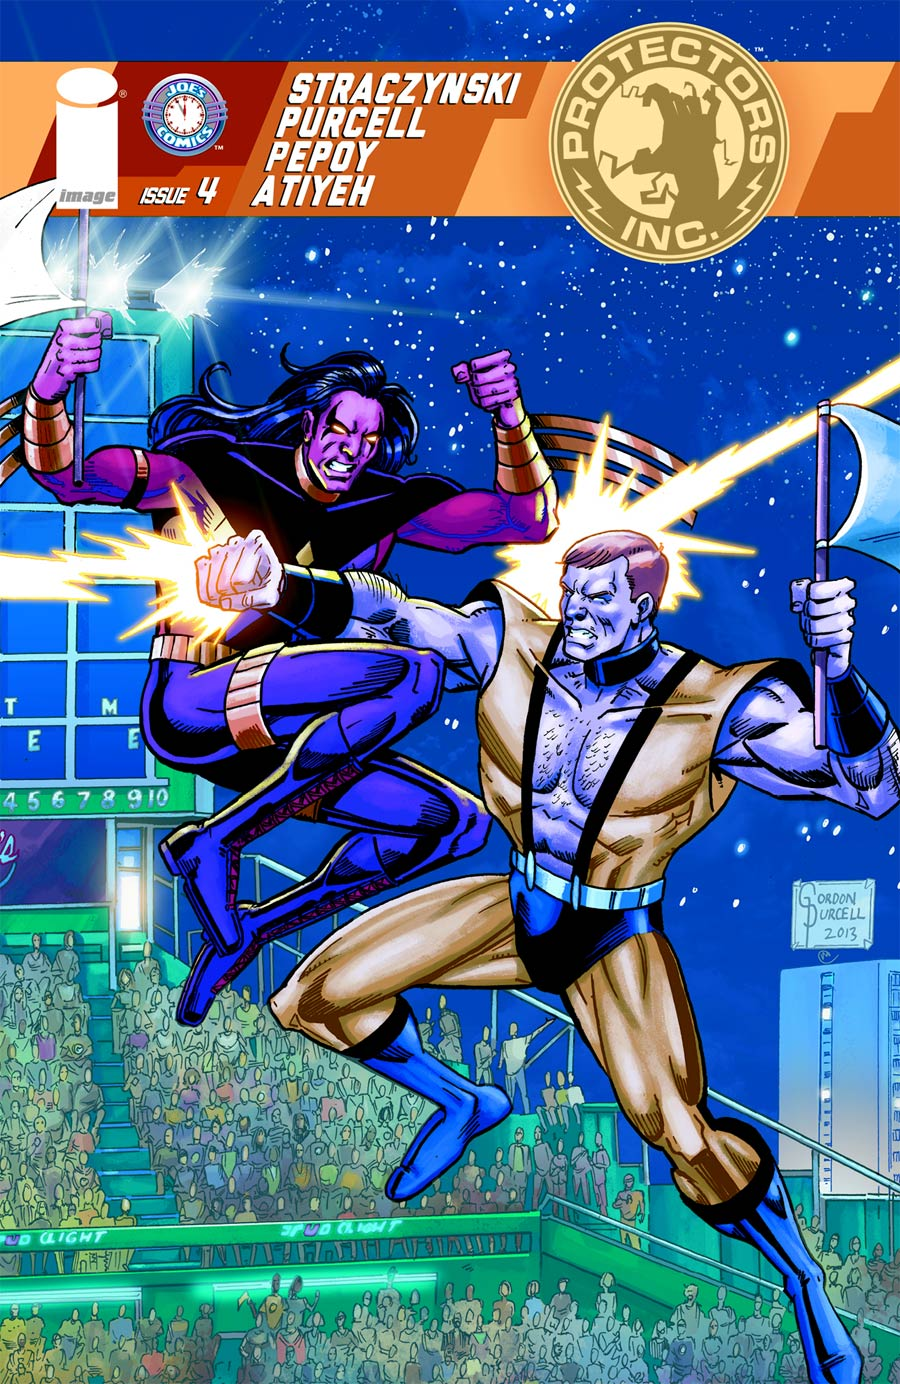 Protectors Inc #4 Cover A Gordon Purcell & Michael Atiyeh